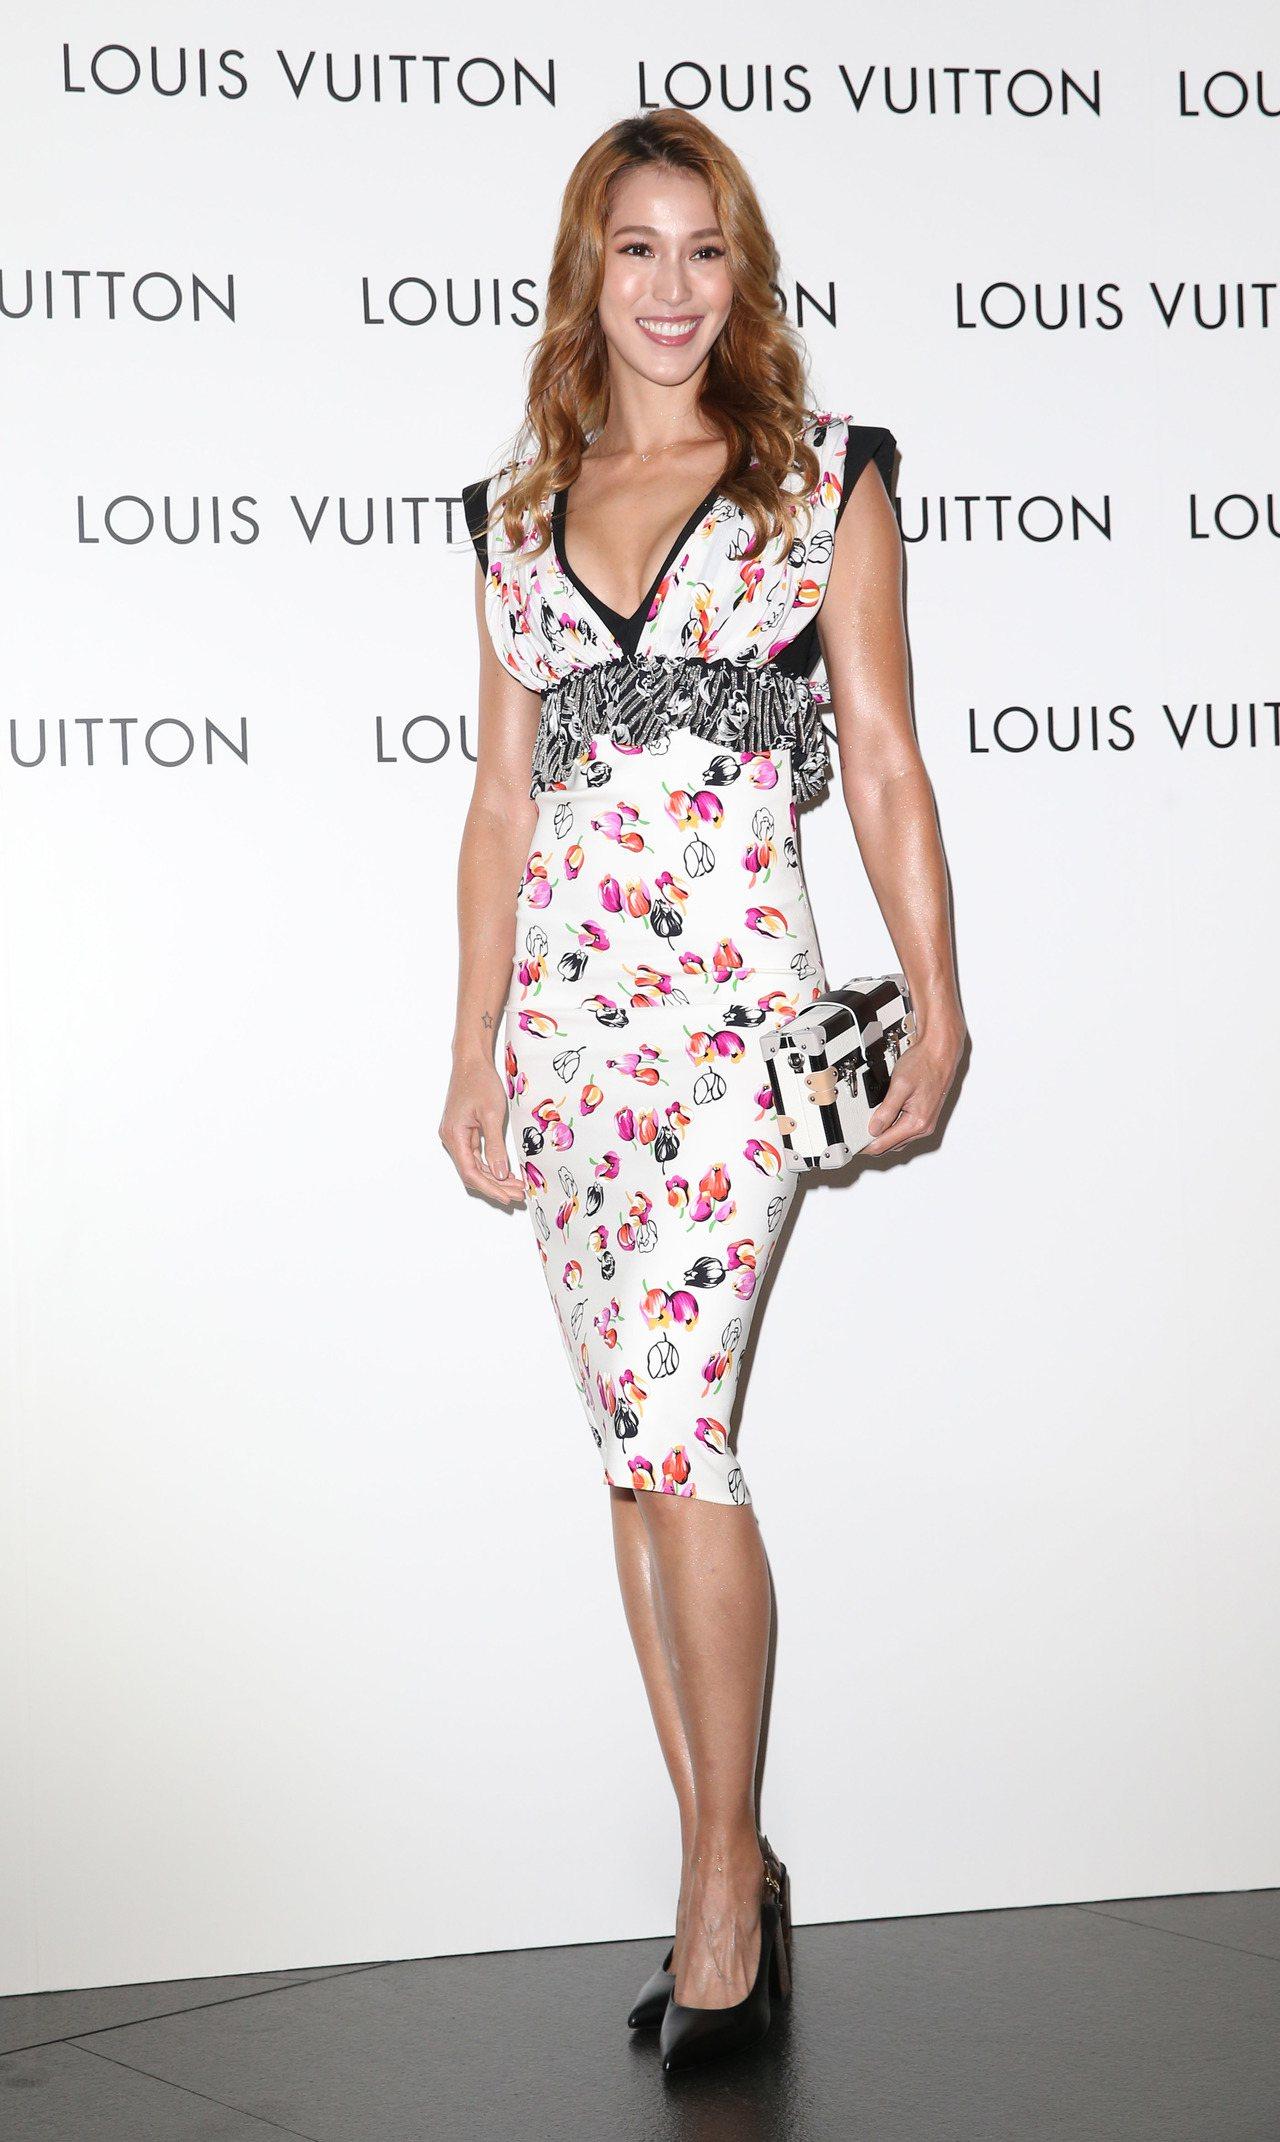 Akemi穿刺繡褶飾高腰連身裙22萬4,000元、高跟鞋價格店洽、Petite ...